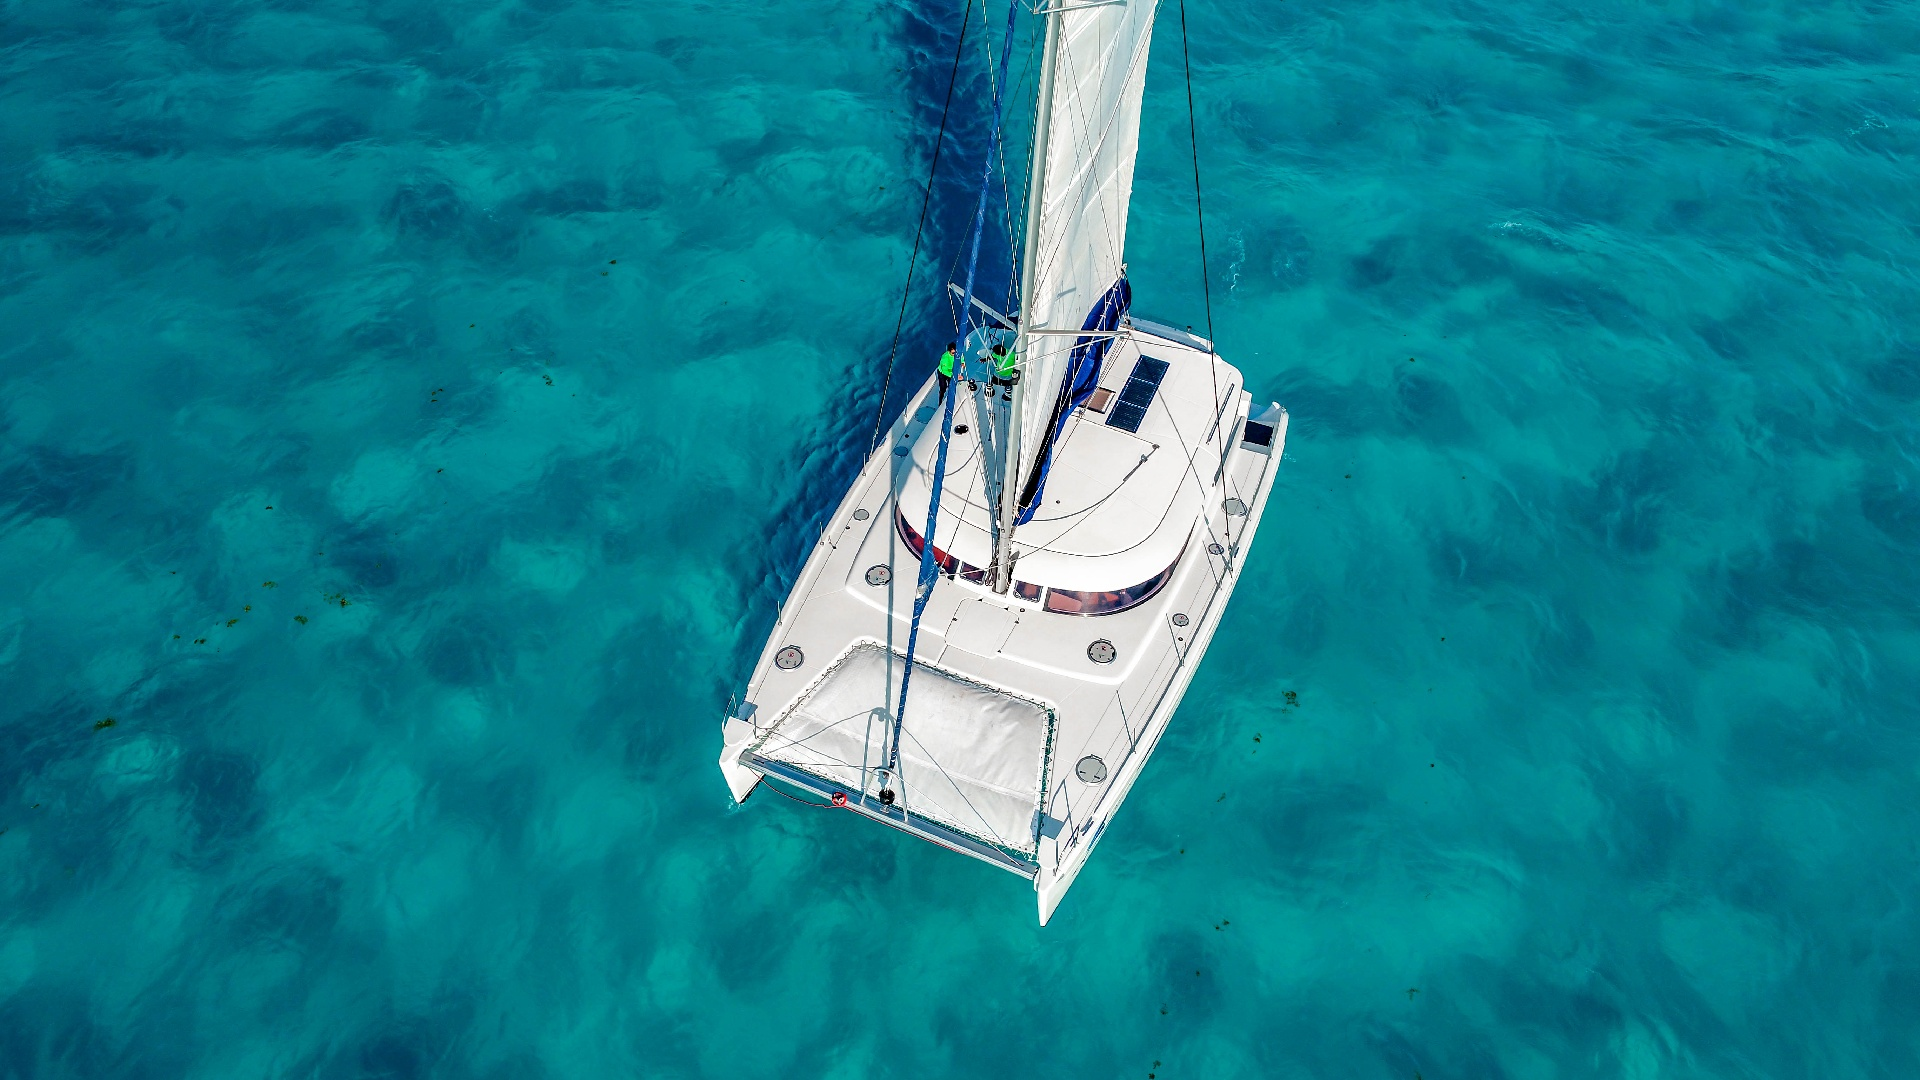 4 - LowRes Megaira- Private tour to Isla Mujeres in catamaran - Cancun Sailing